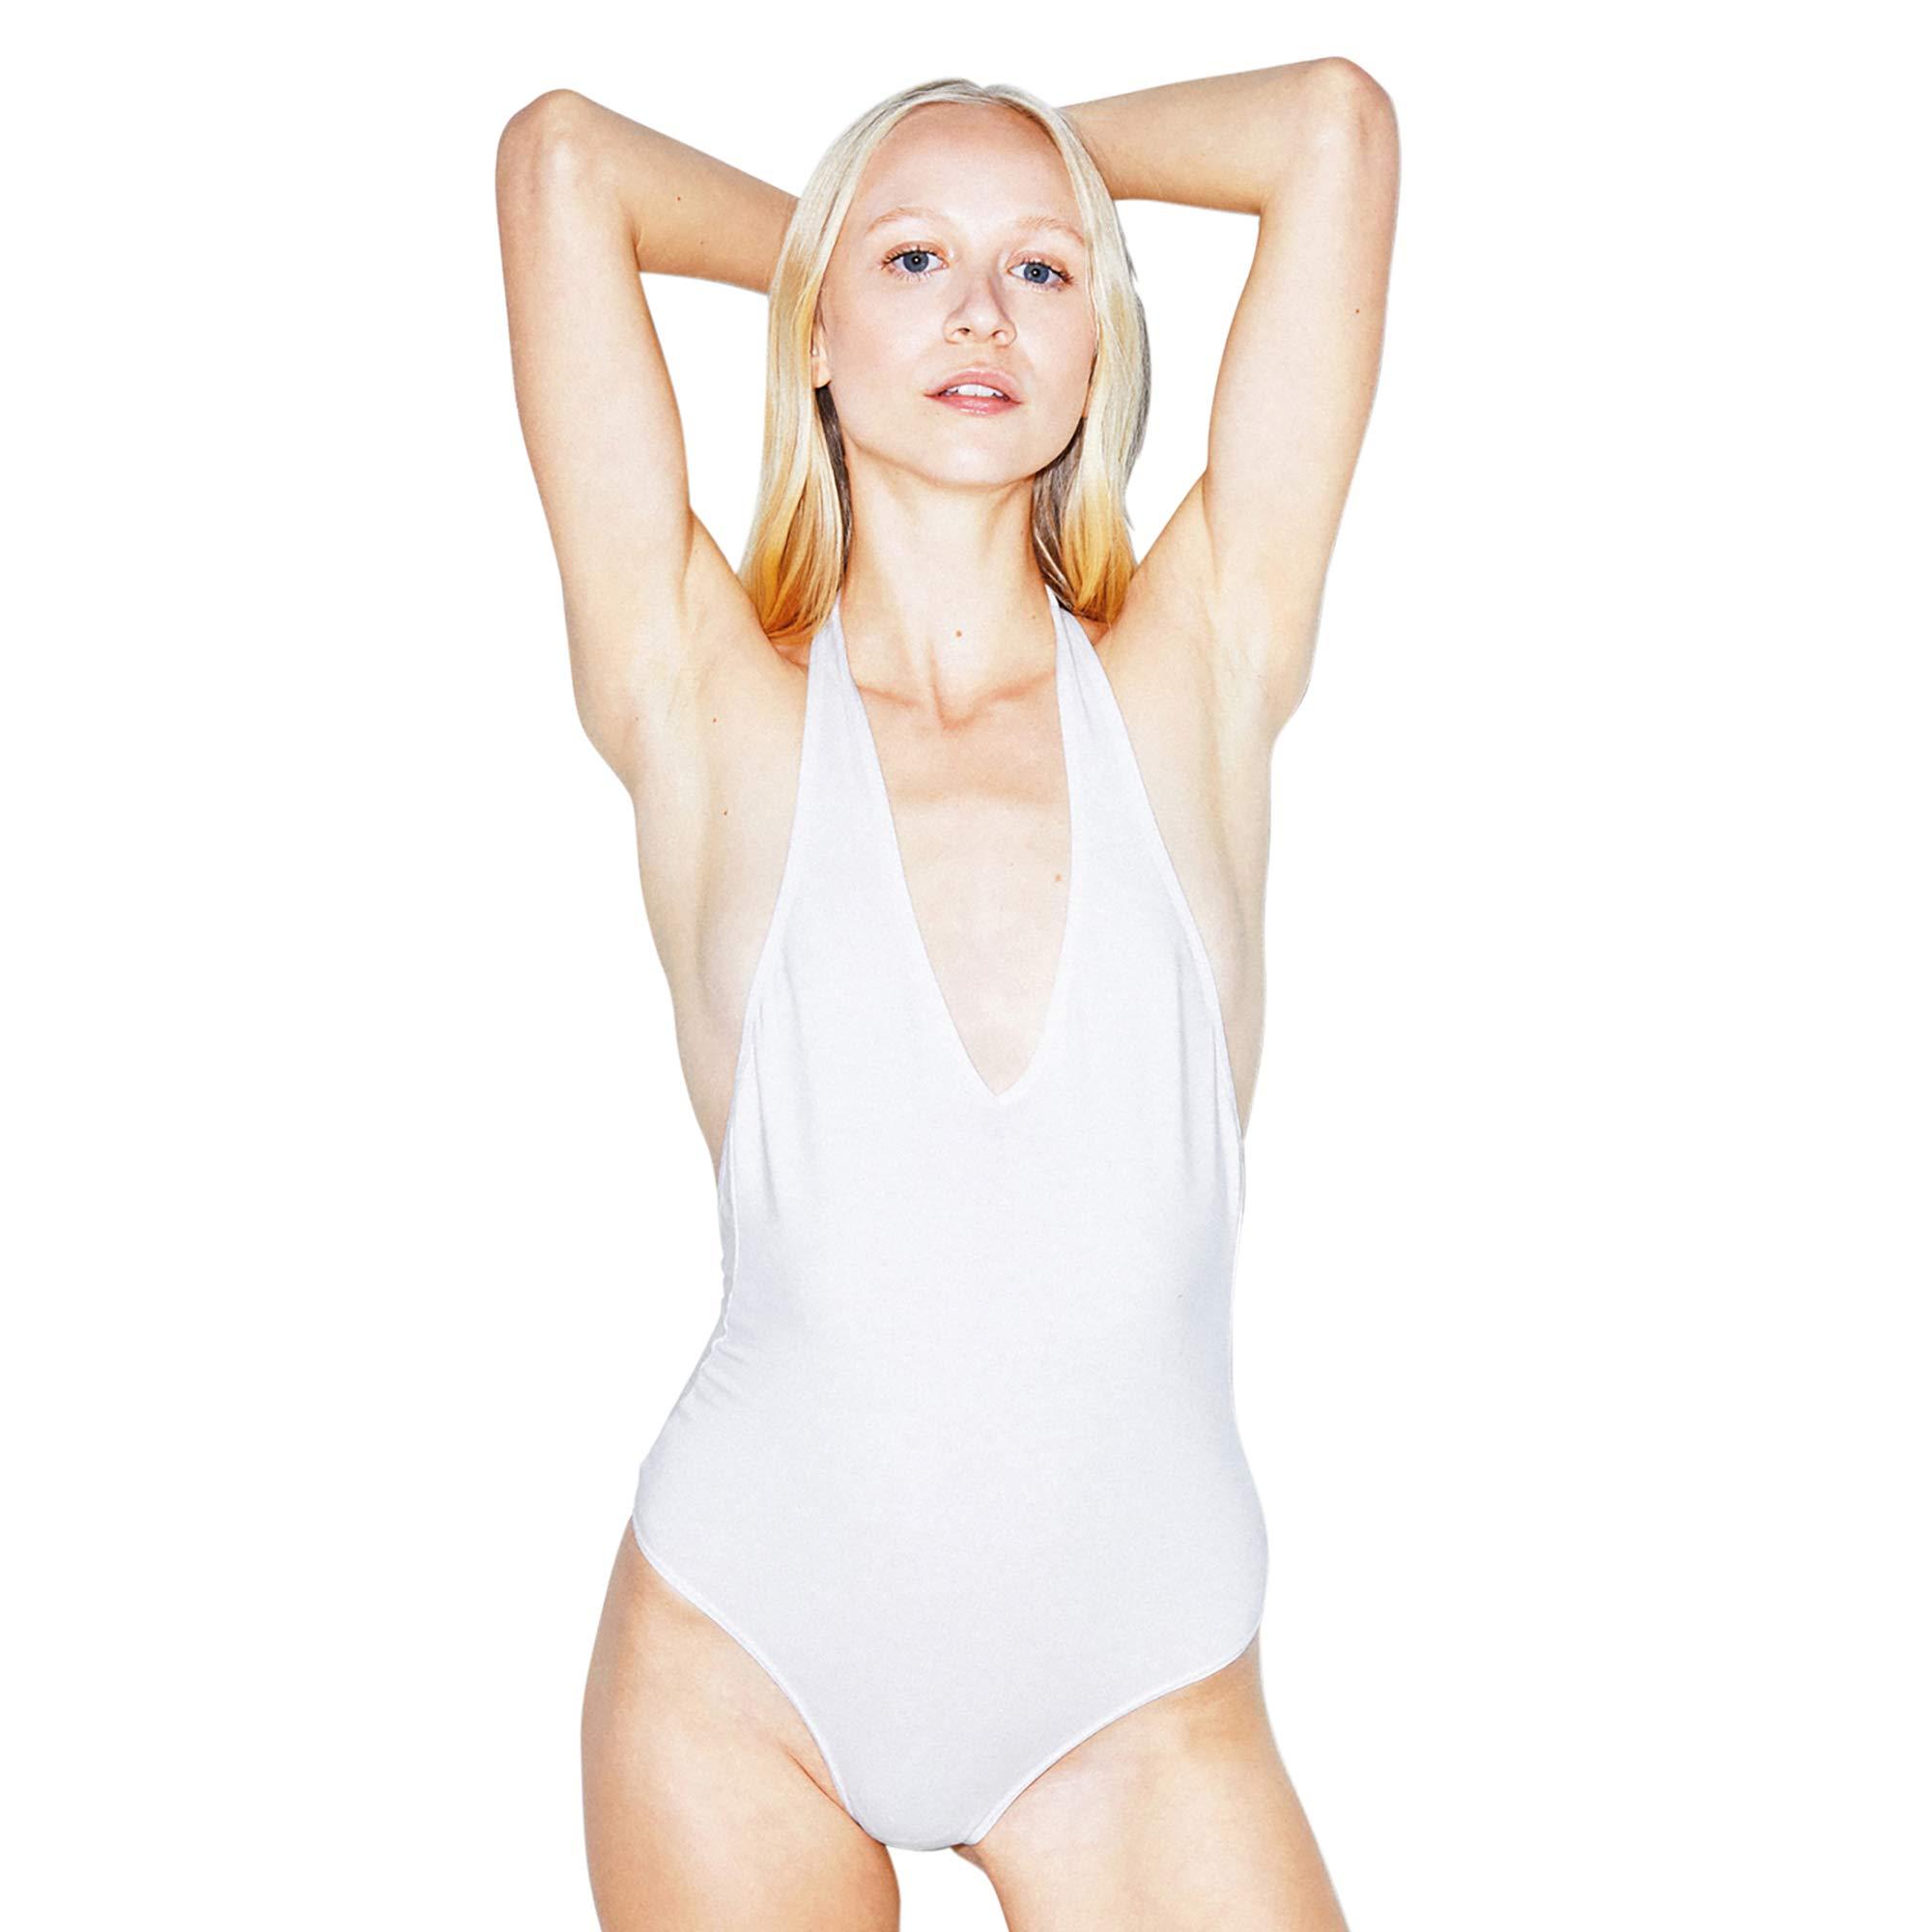 American Apparel Women's Cotton Spandex Halter Bodysuit